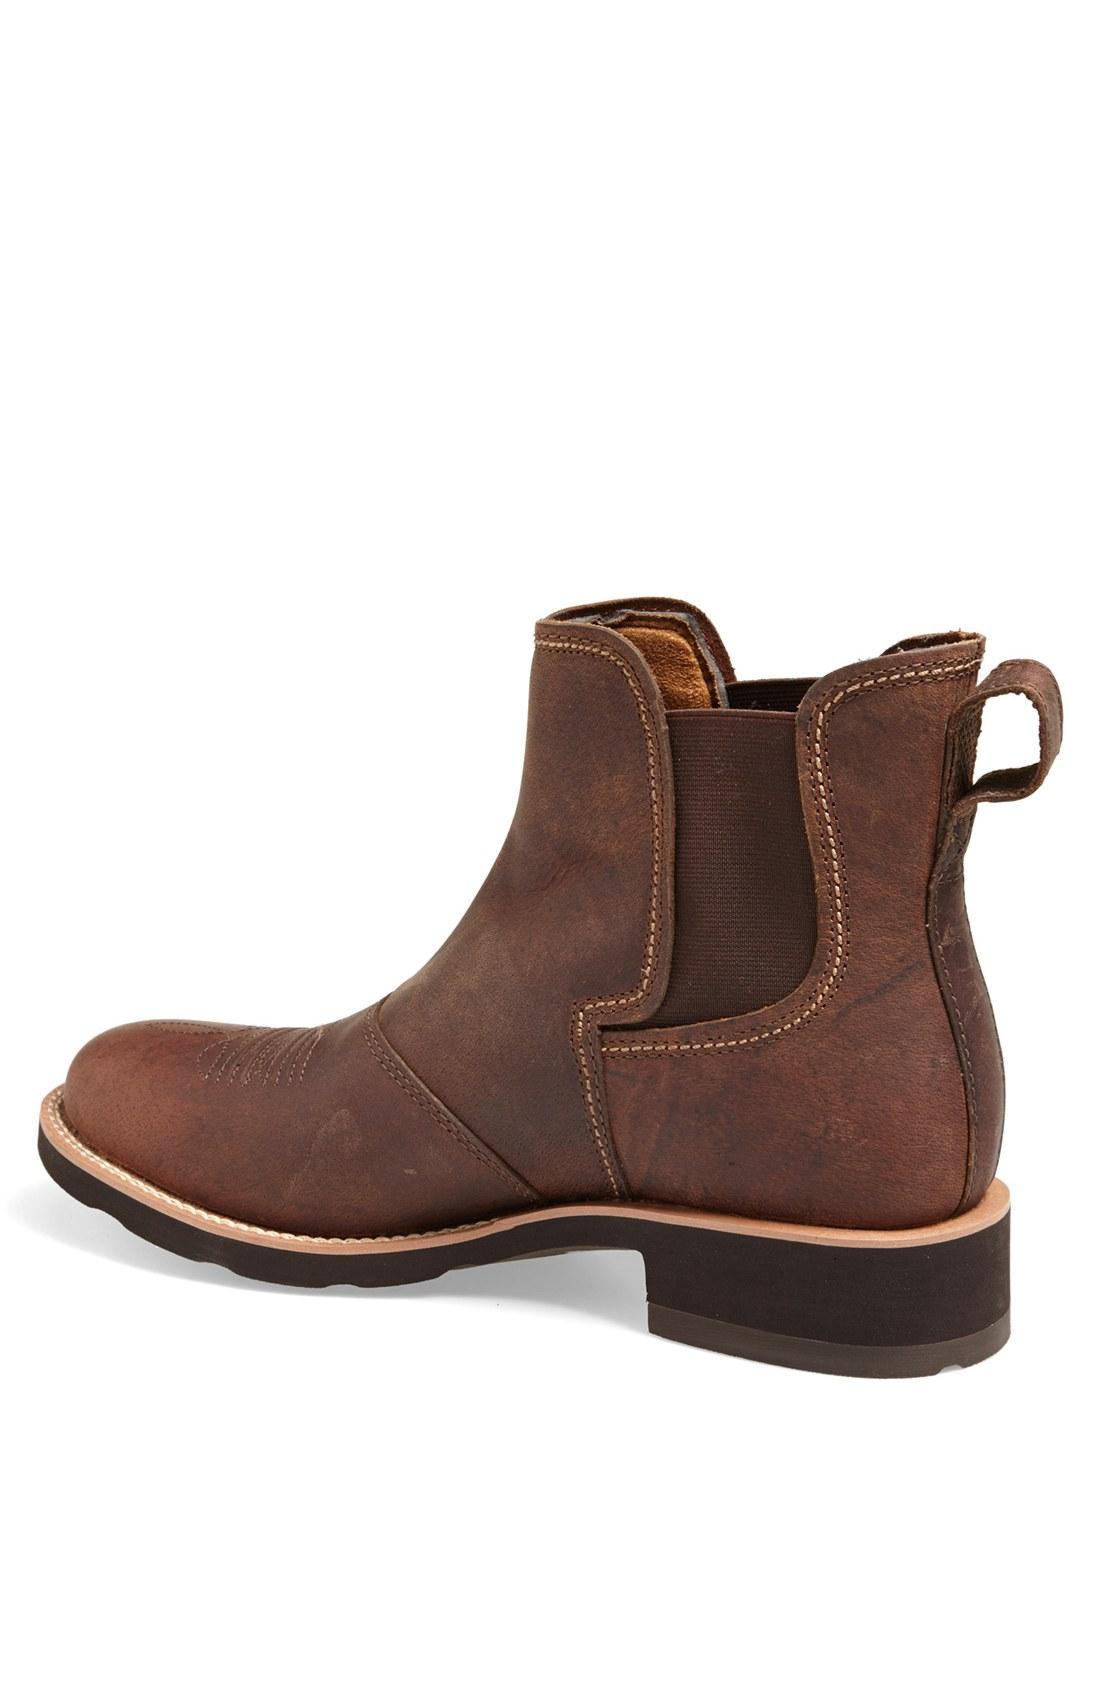 Ariat Ambush Chelsea Boot in Brown for Men | Lyst